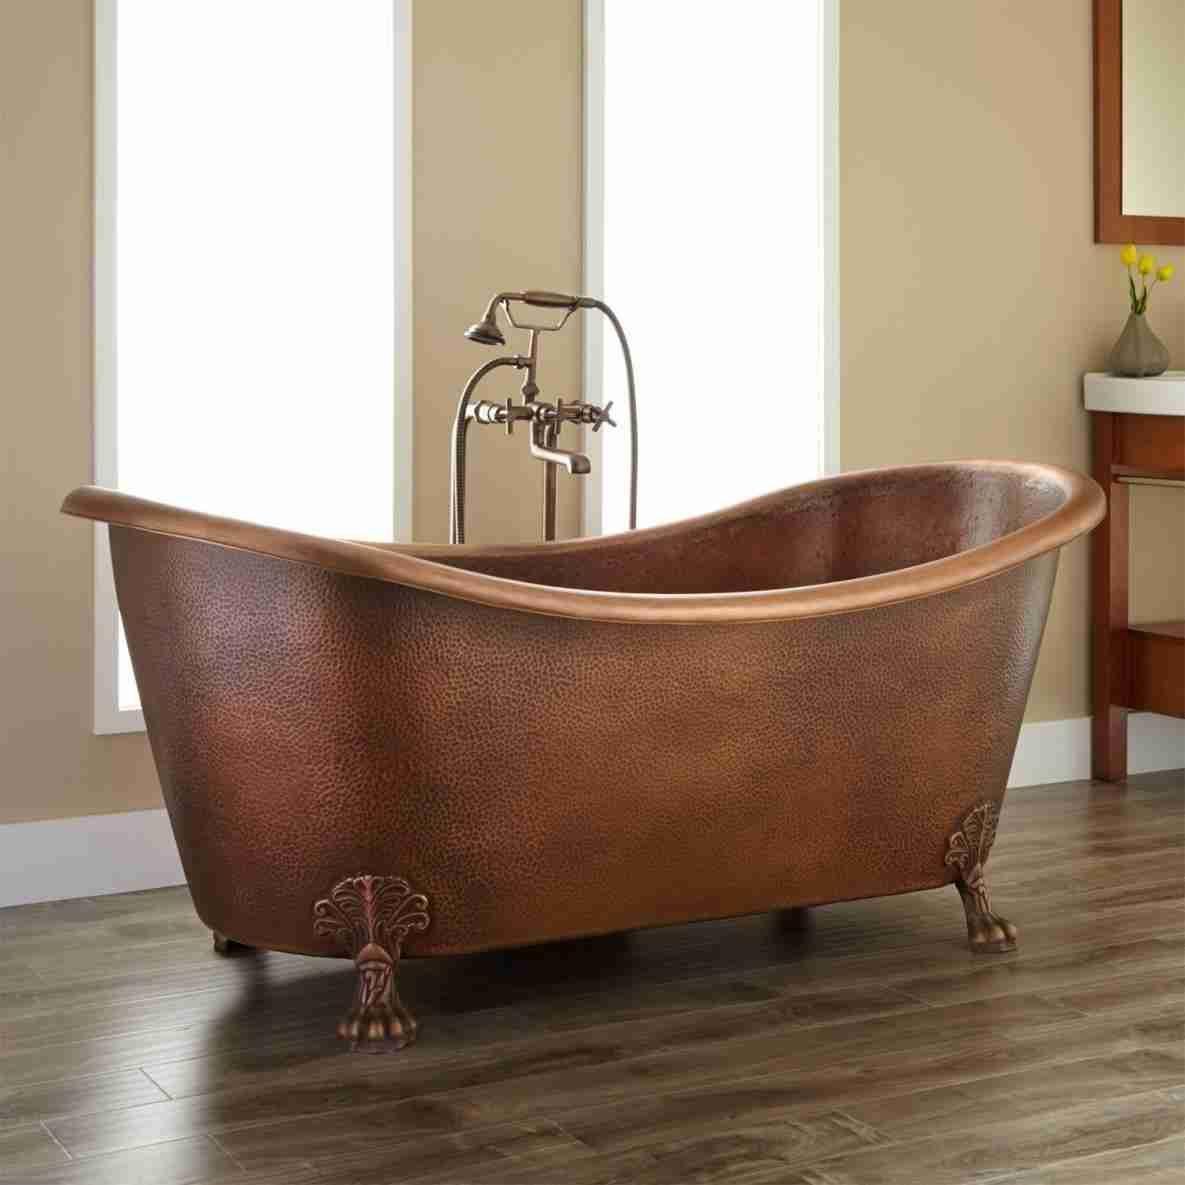 New post Trending-copper clawfoot bathtub-Visit-entermp3.online ...